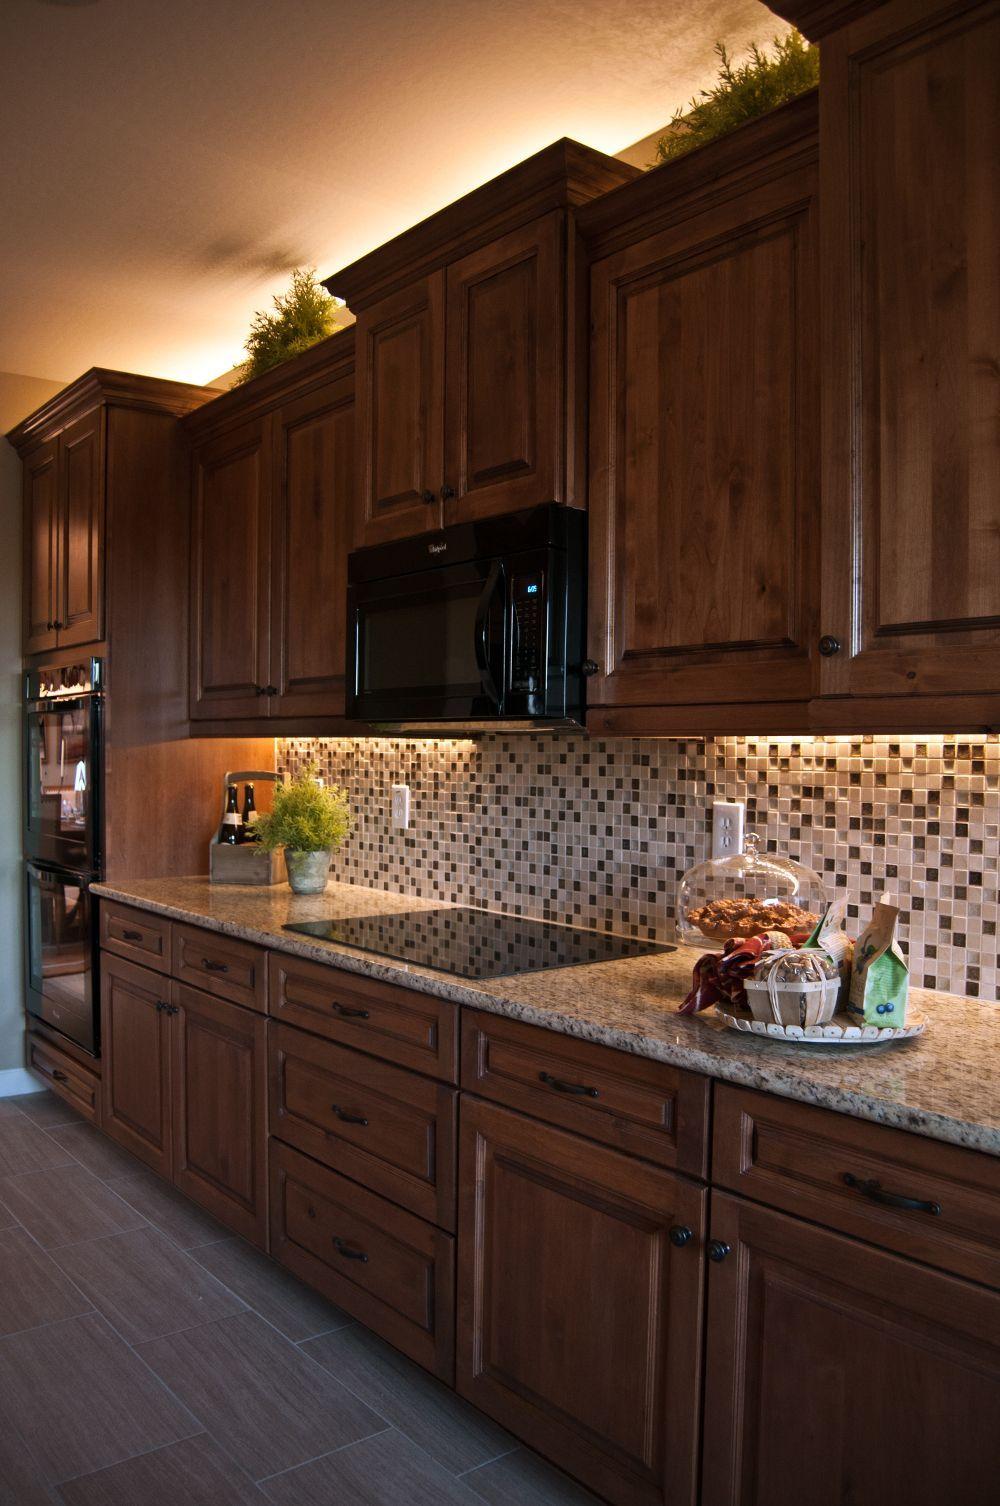 Installing Led Lights Under Kitchen Cabinets In 2020 Light Kitchen Cabinets Kitchen Under Cabinet Lighting Above Kitchen Cabinets